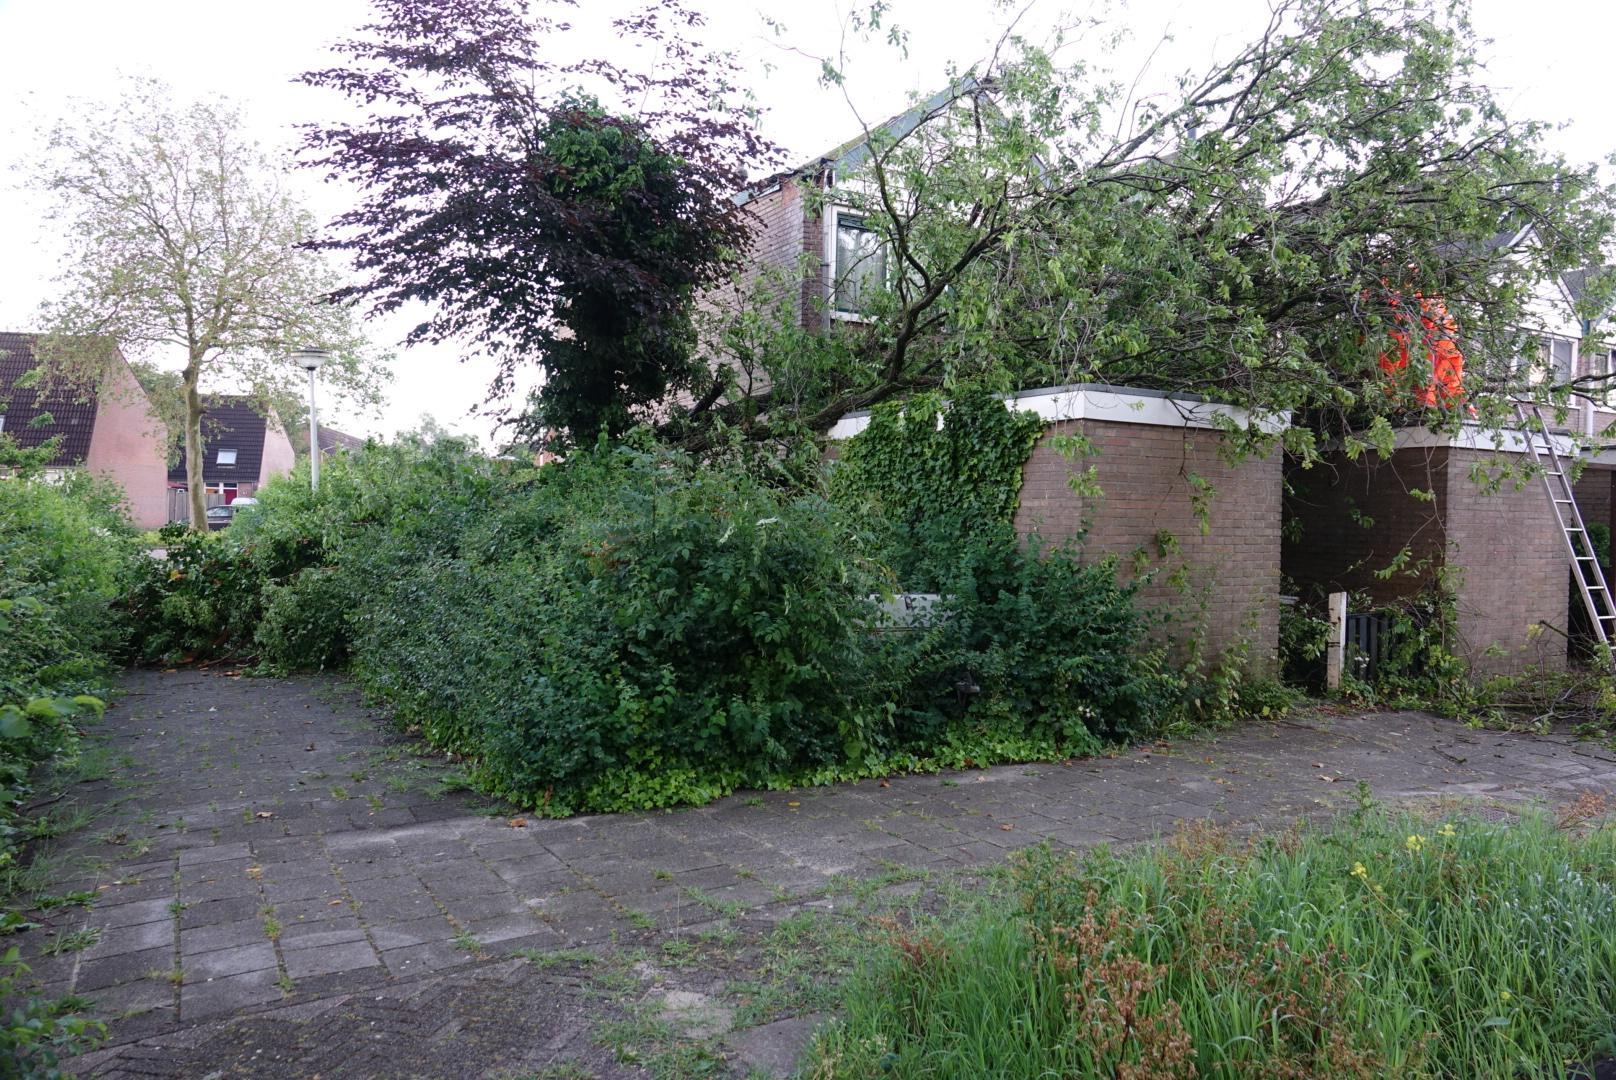 Noodweer slaat ook toe in Krommenie: boom valt op drie schuurtjes en dak van woning